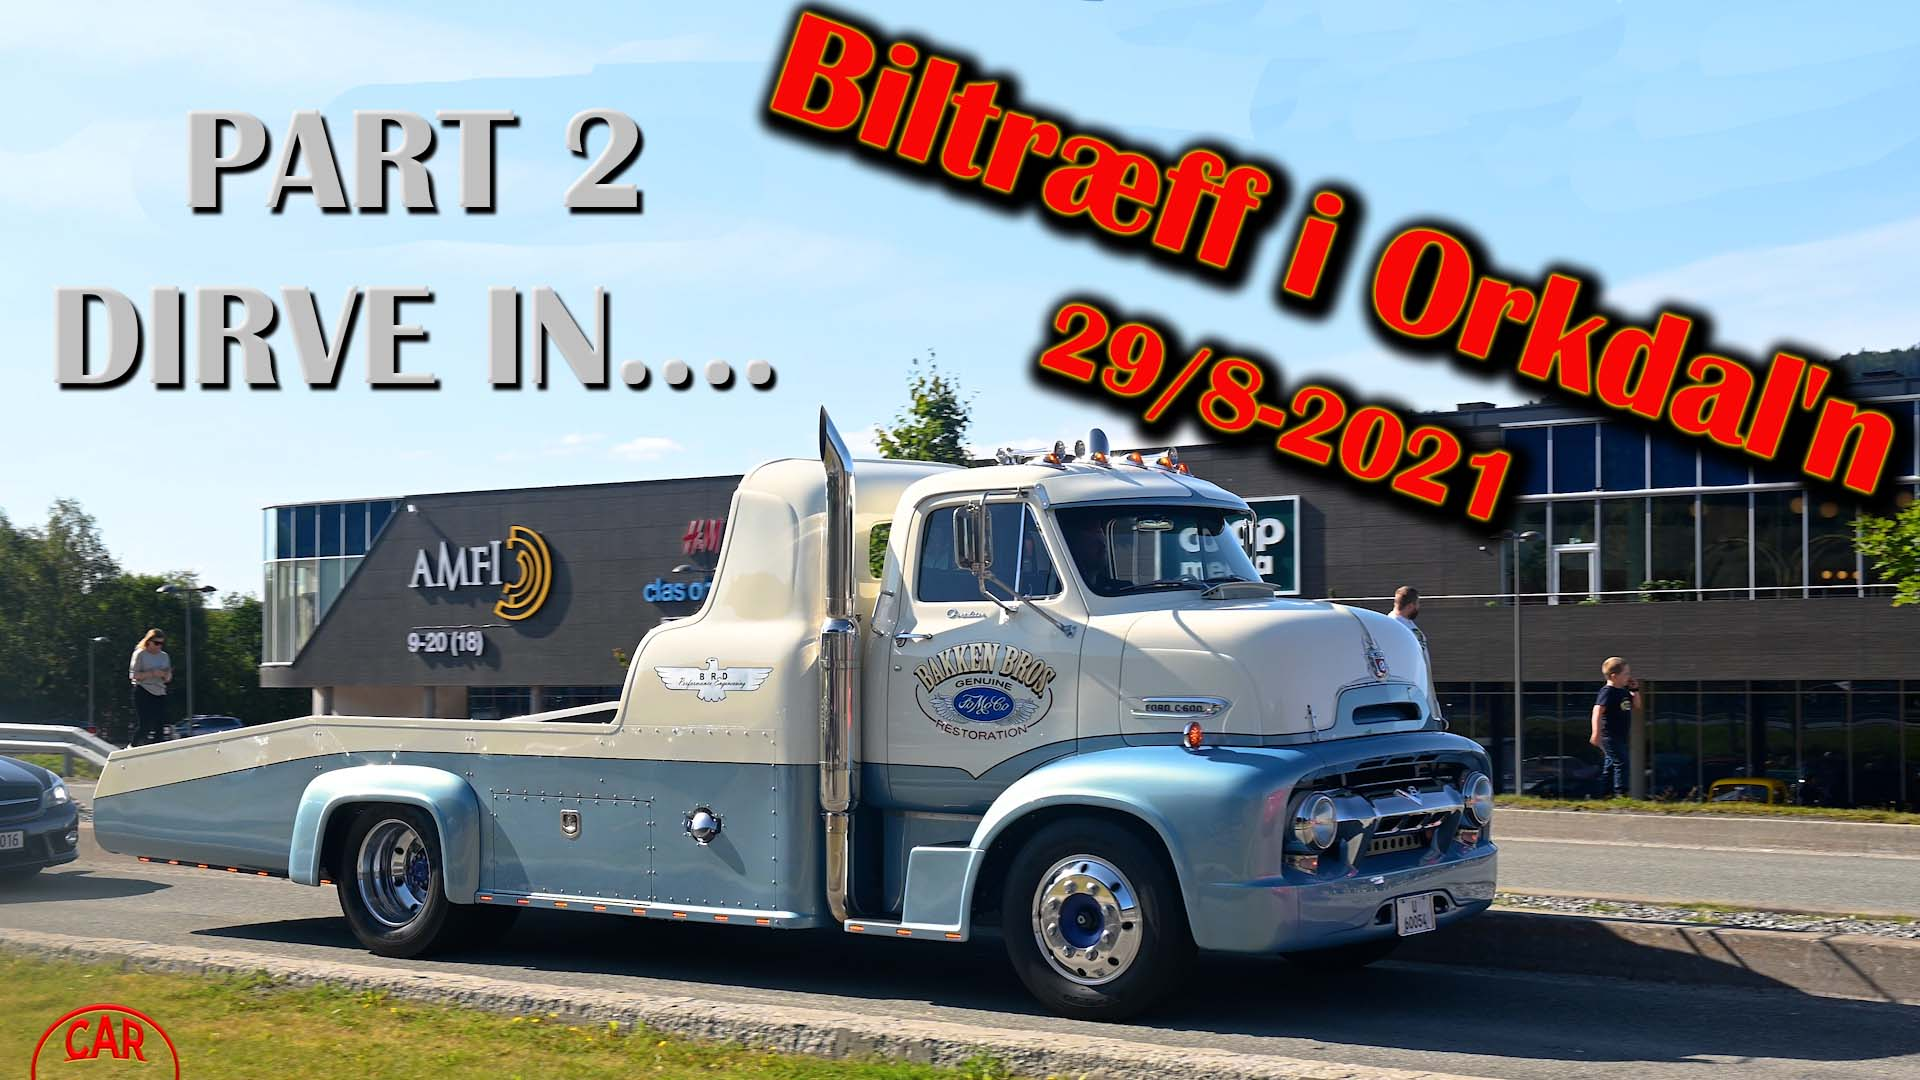 Biltræff i Orkdal'n 2021 – 29/8 – PART 2 – DRIVE IN